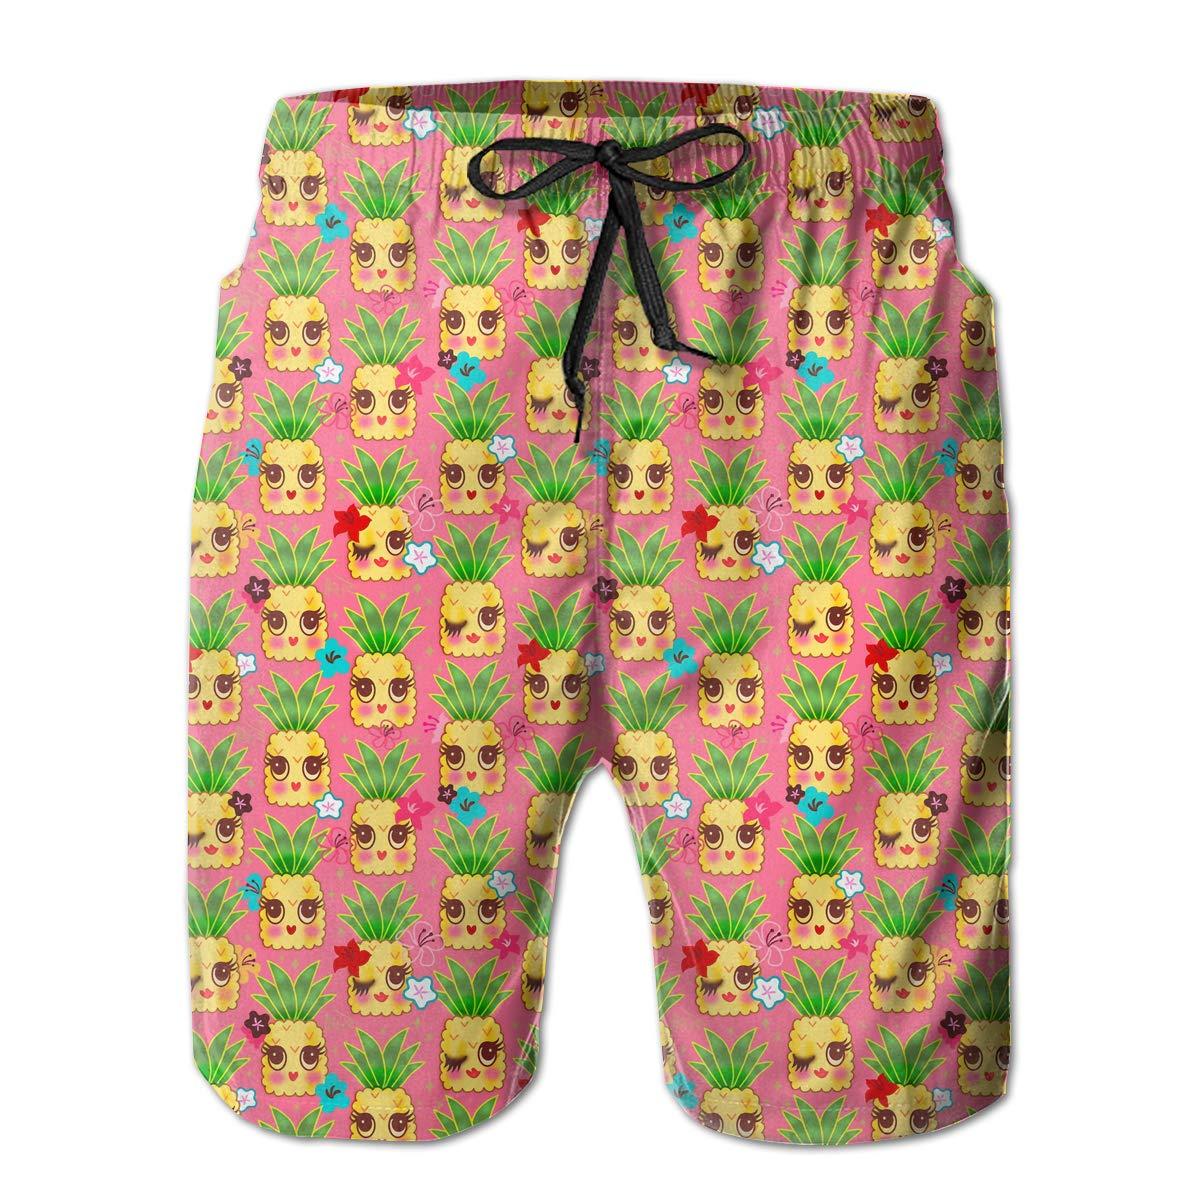 HFSST Cute Pink Yellow Pineapple Mens Swim Trunks Bathing Suit Shorts Board Beach